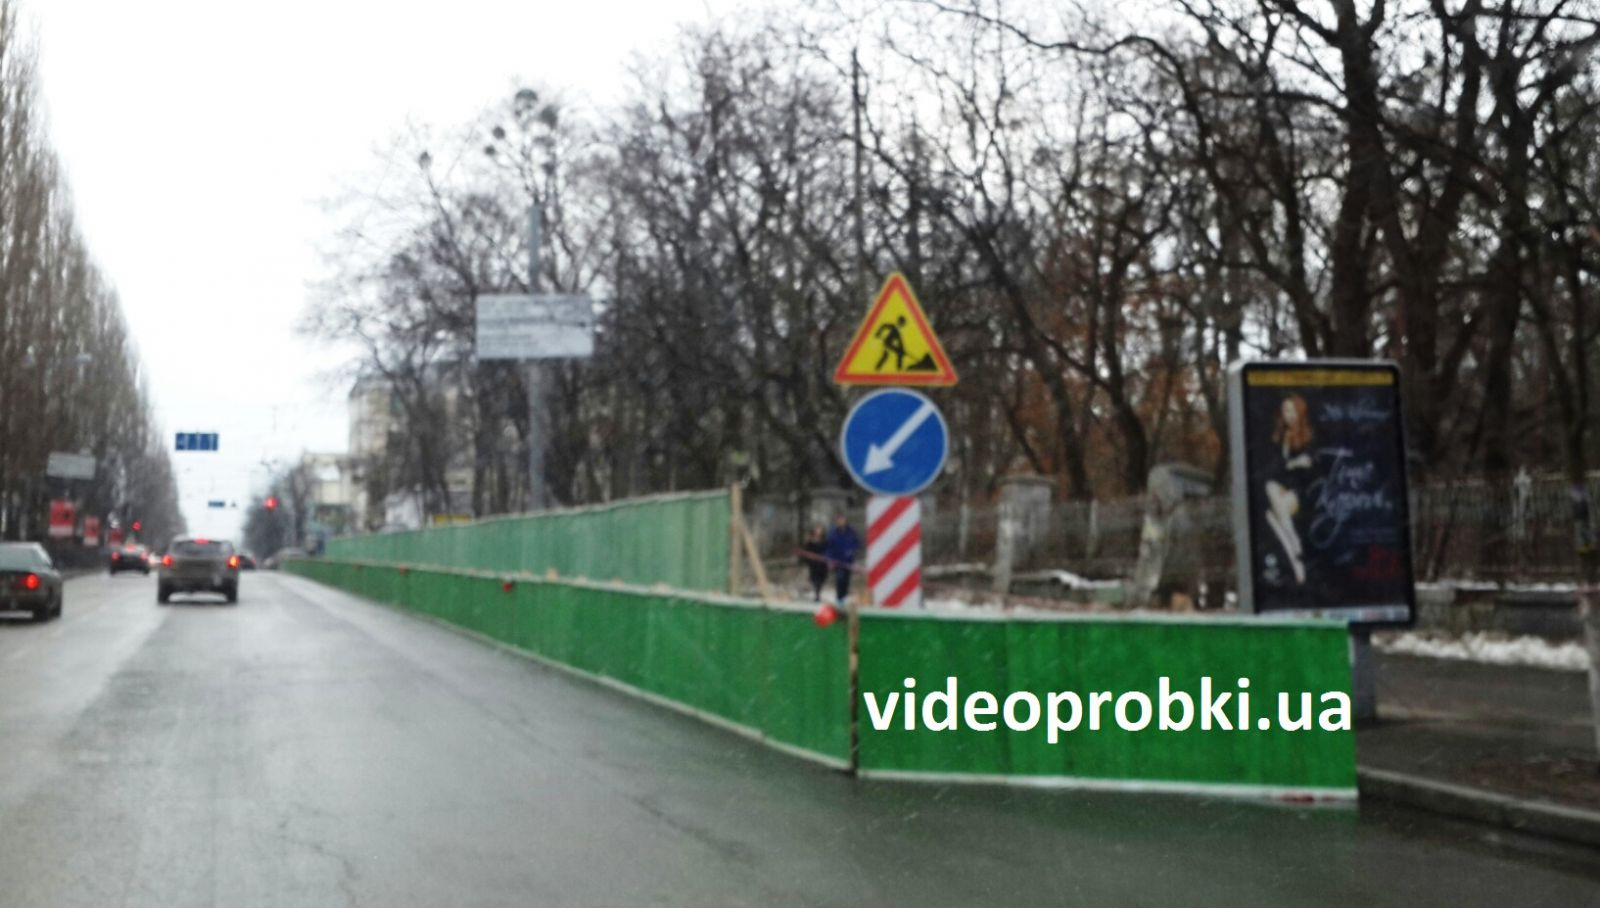 Бульвар Тараса Шевченко в Киеве